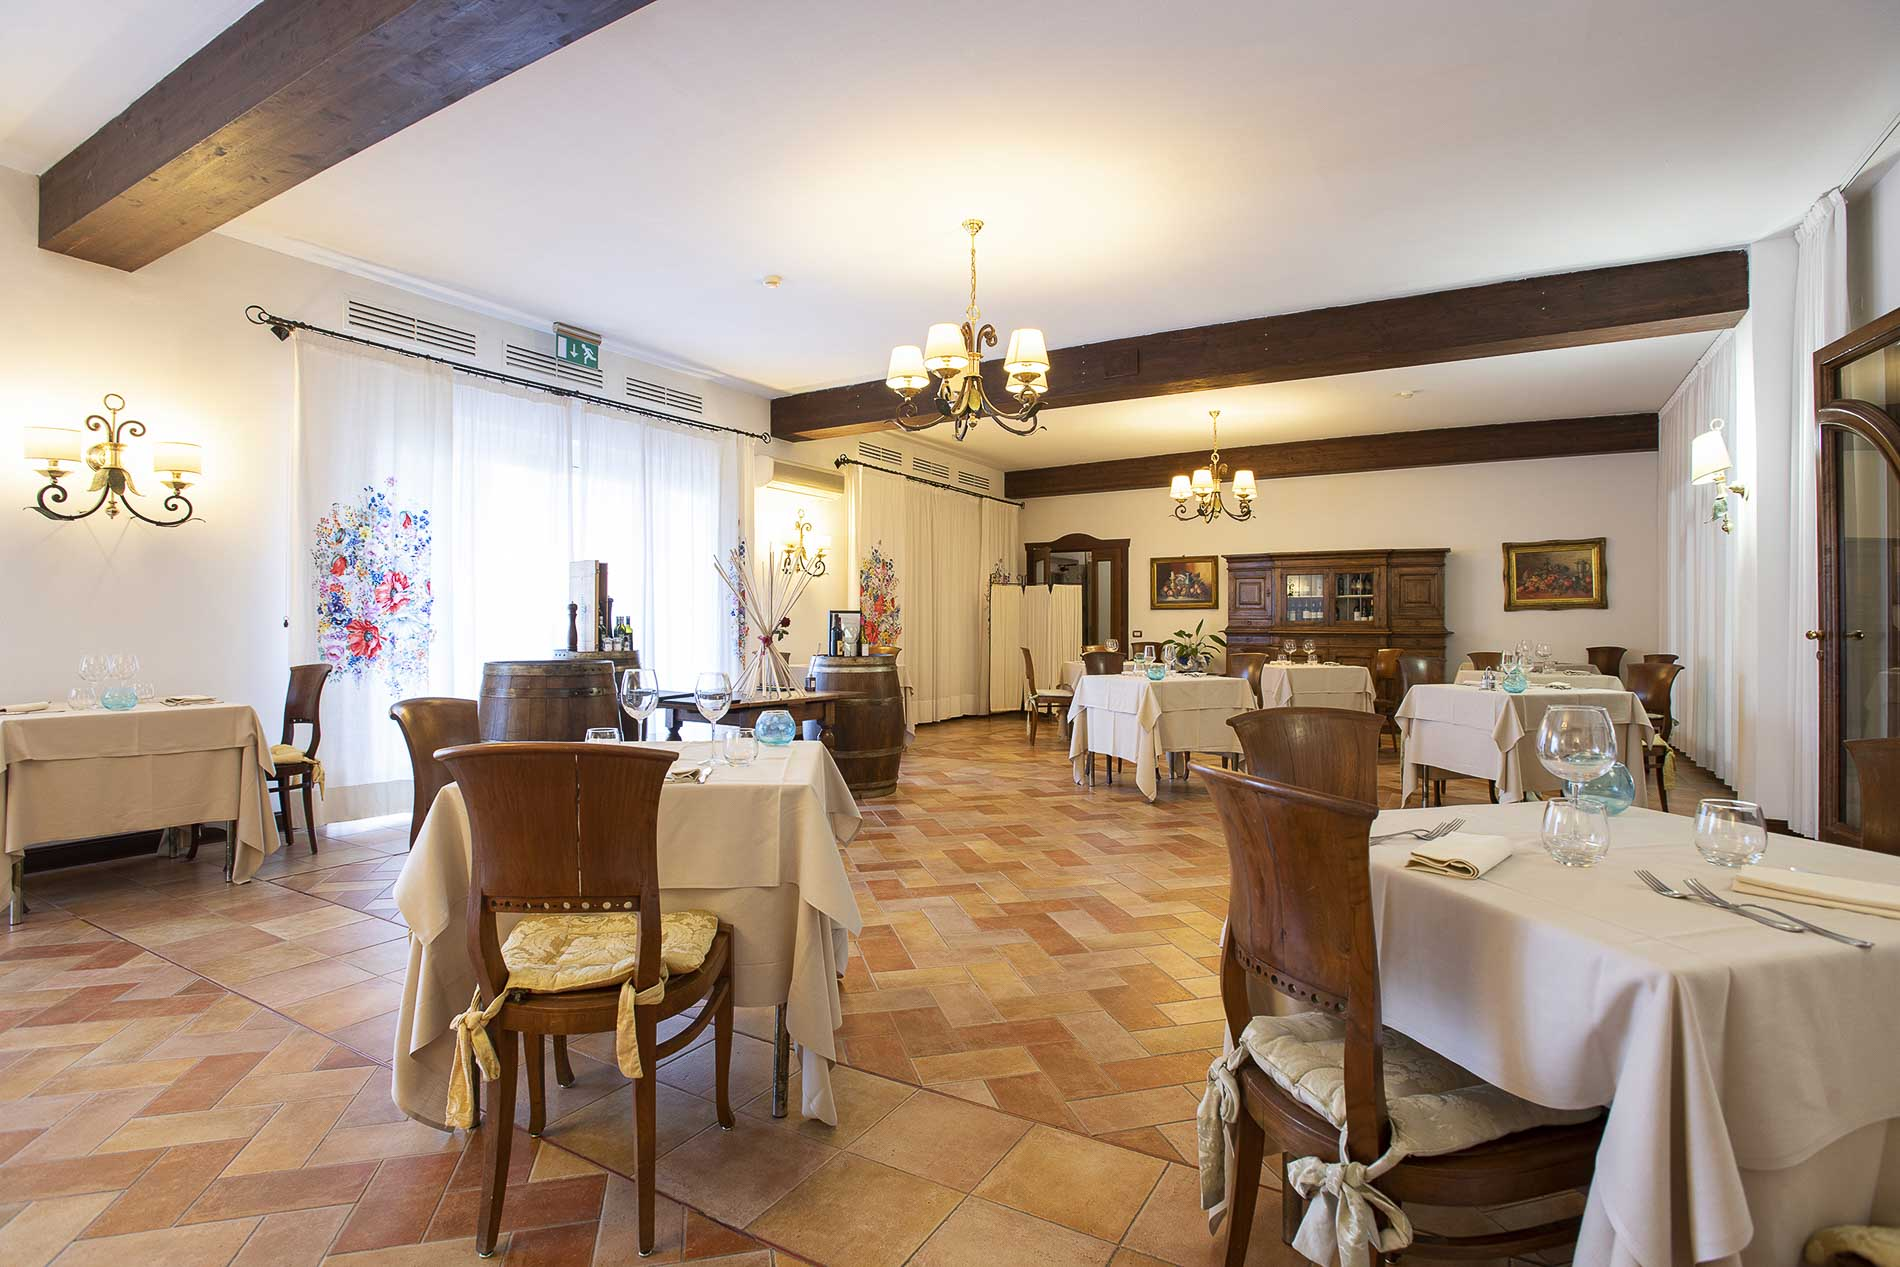 Caletra Restaurant